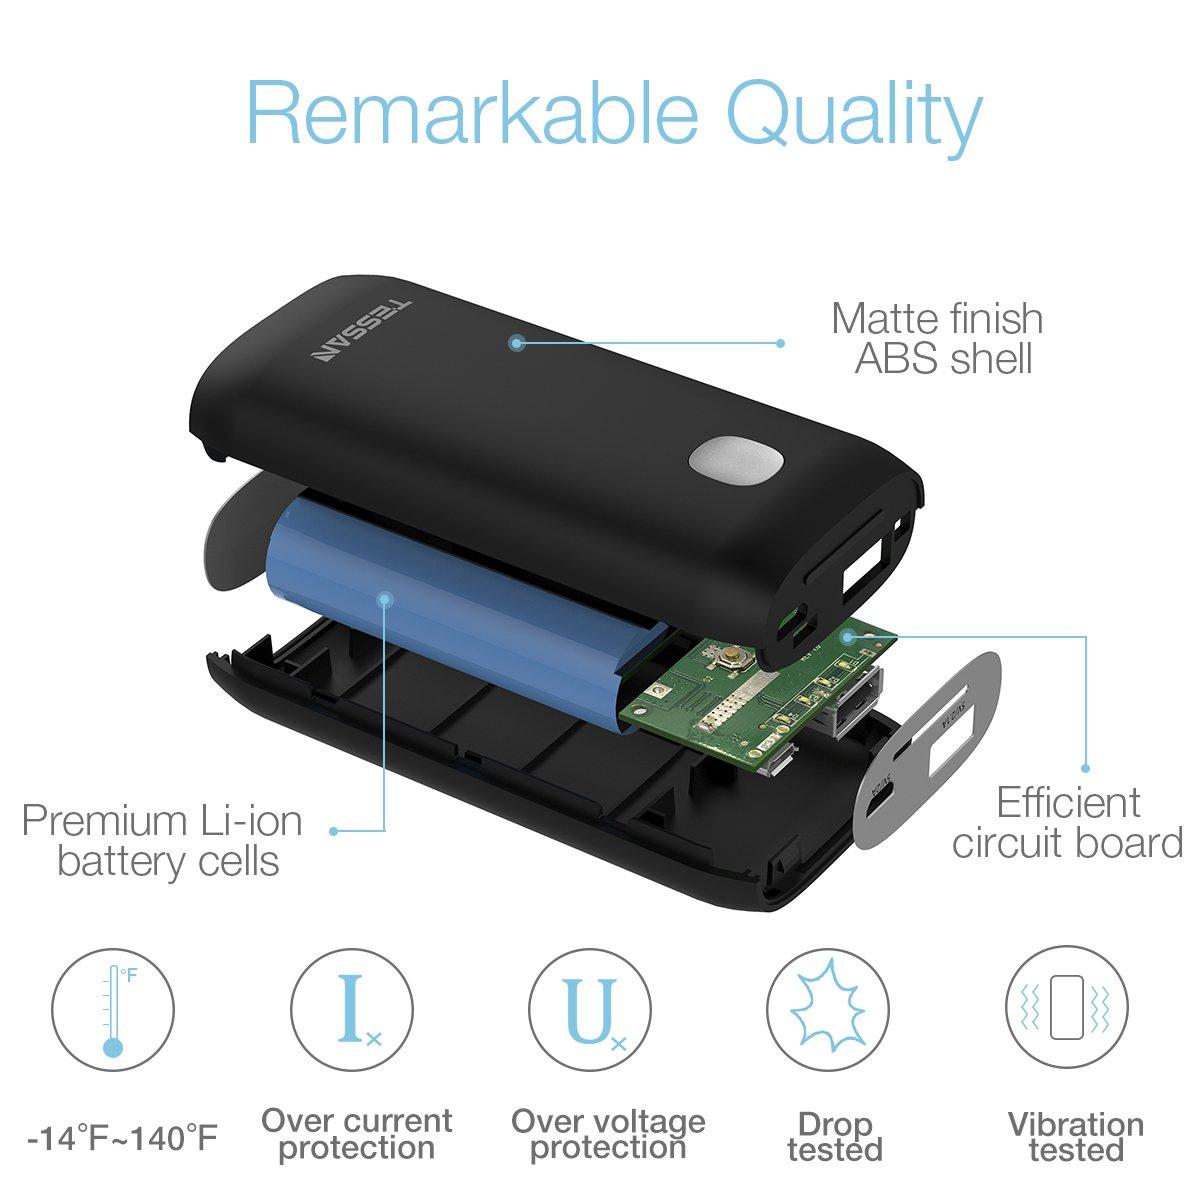 Externer Akku Power Bank Power Pack Ladegerät 5200mAh Tragbar Handy Ladegerät für iPhone X 8 8Plus 7 6s 6Plus, iPad, Samsung Galaxy und weitere Smartphones